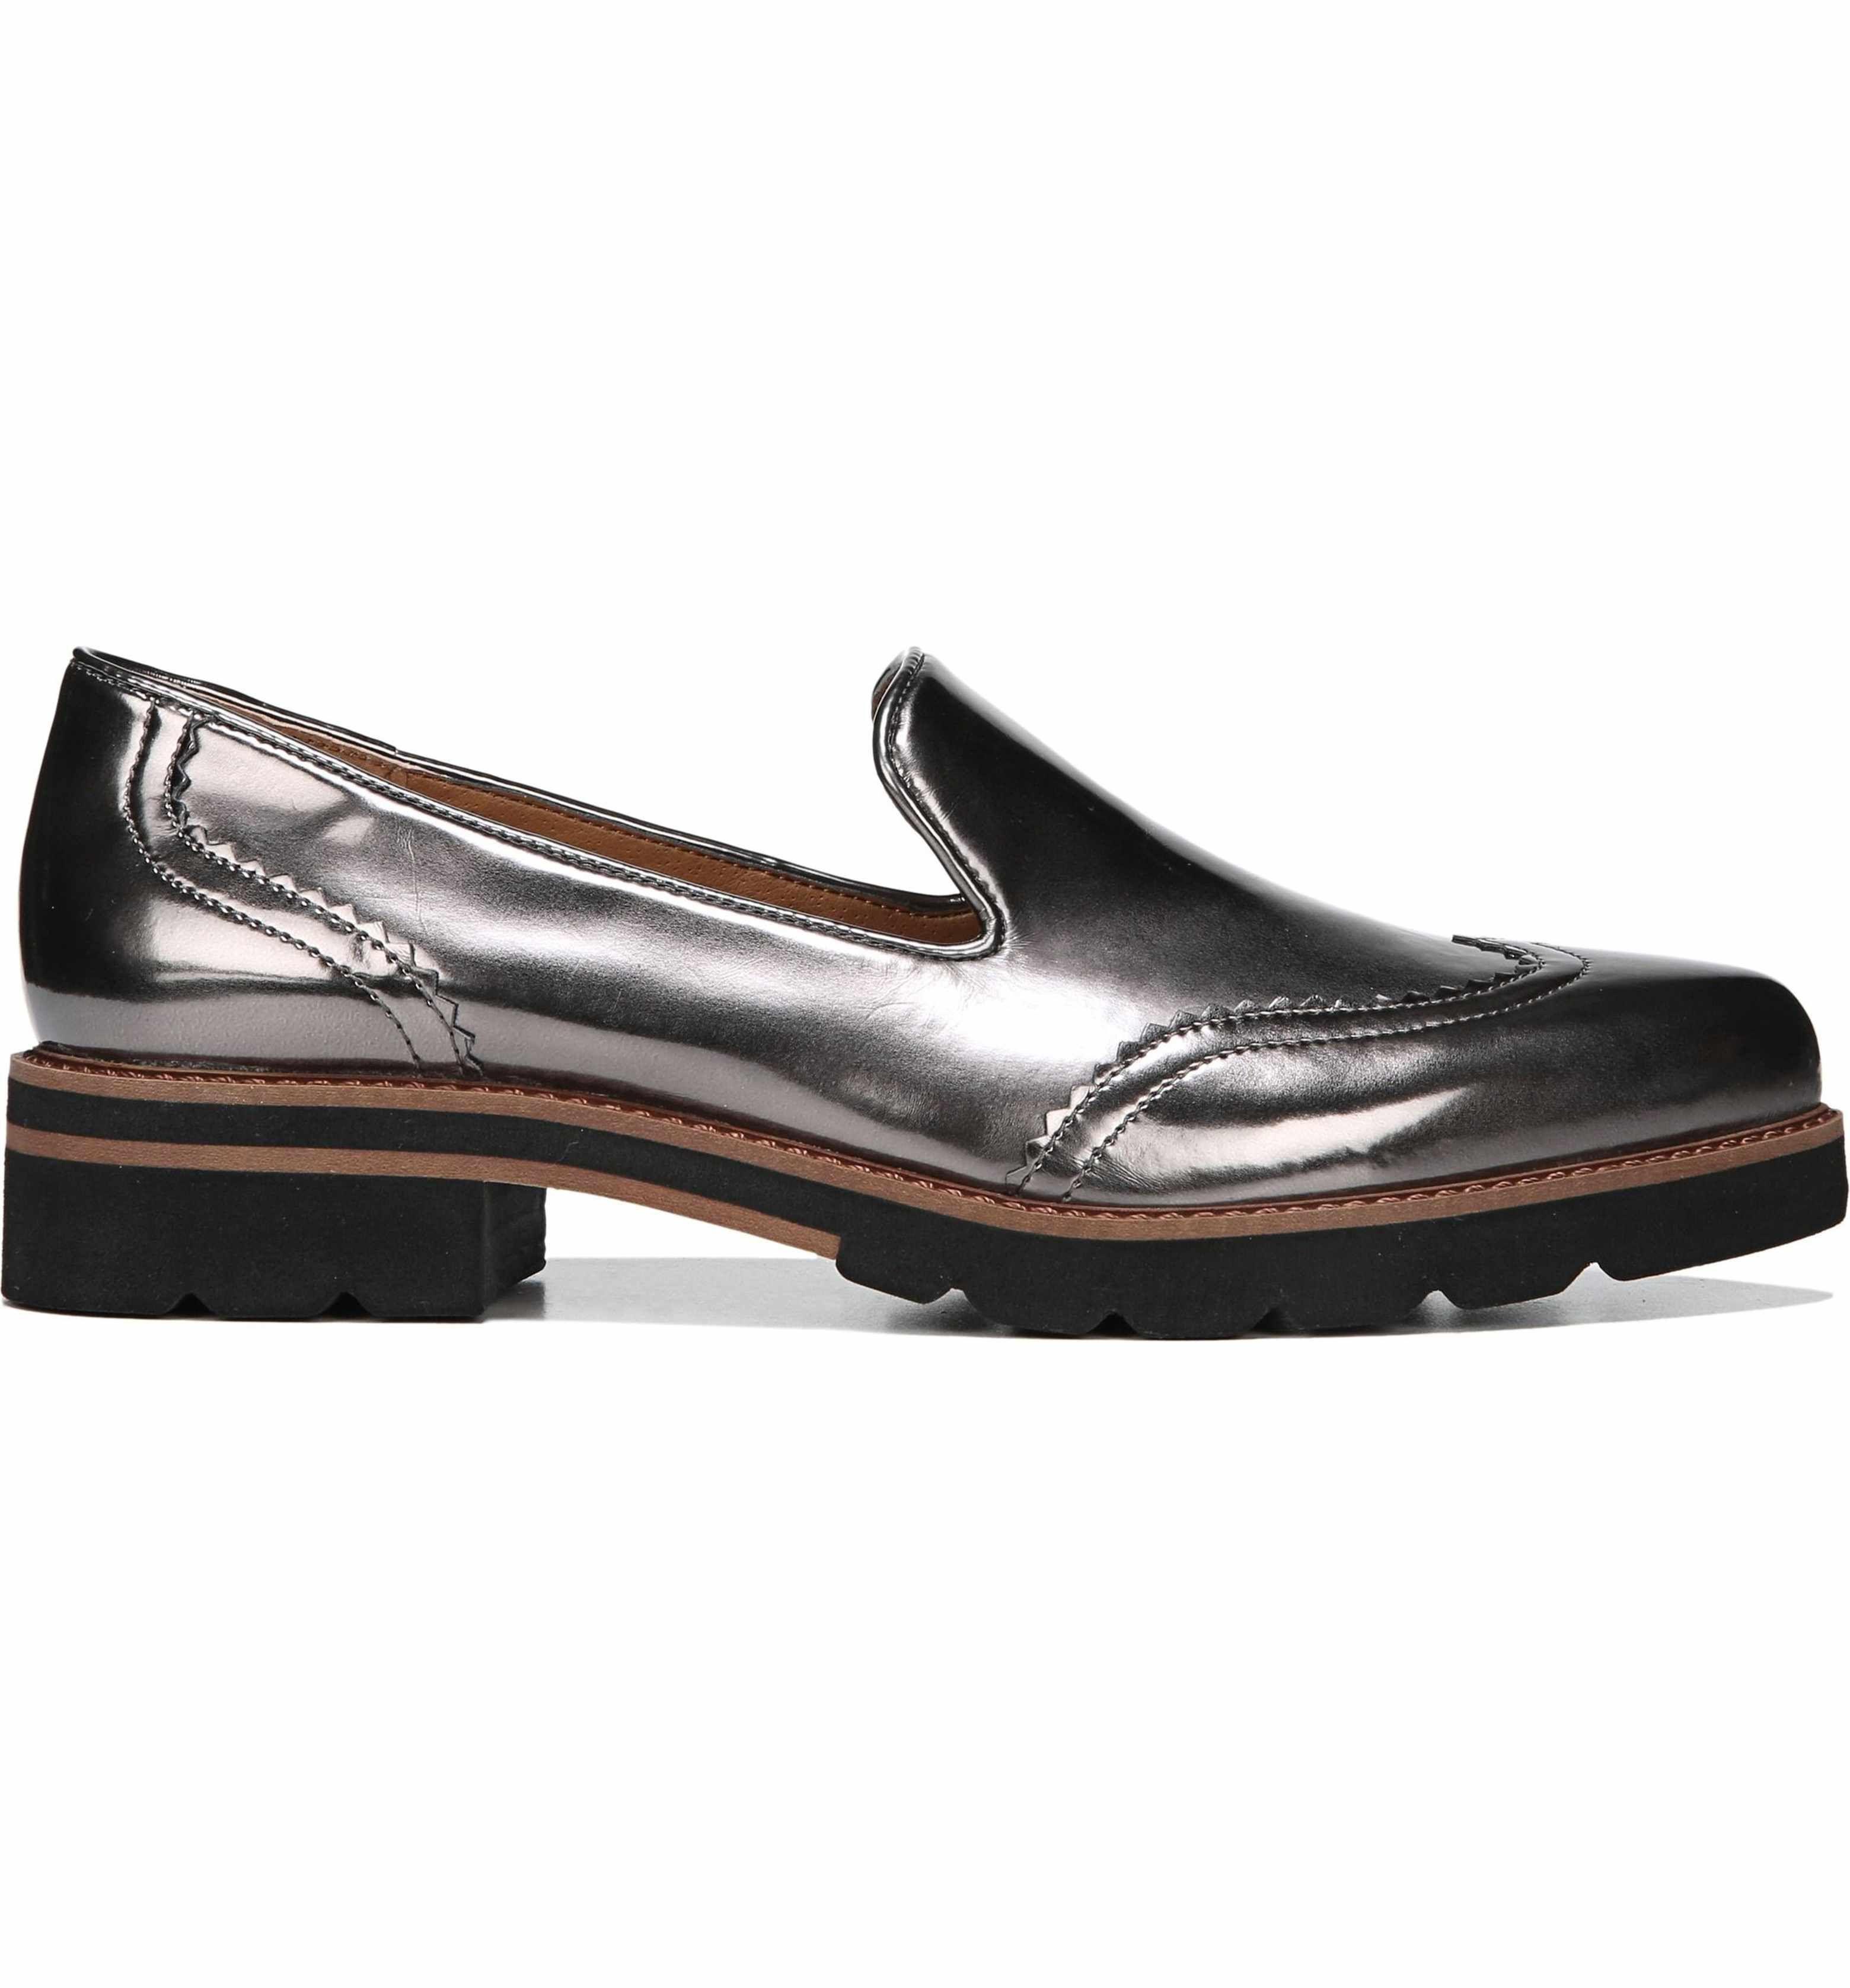 Franco Sarto Sarto by Franco Sarto Betsy Metallic Block Heel Loafers Pti0Jy